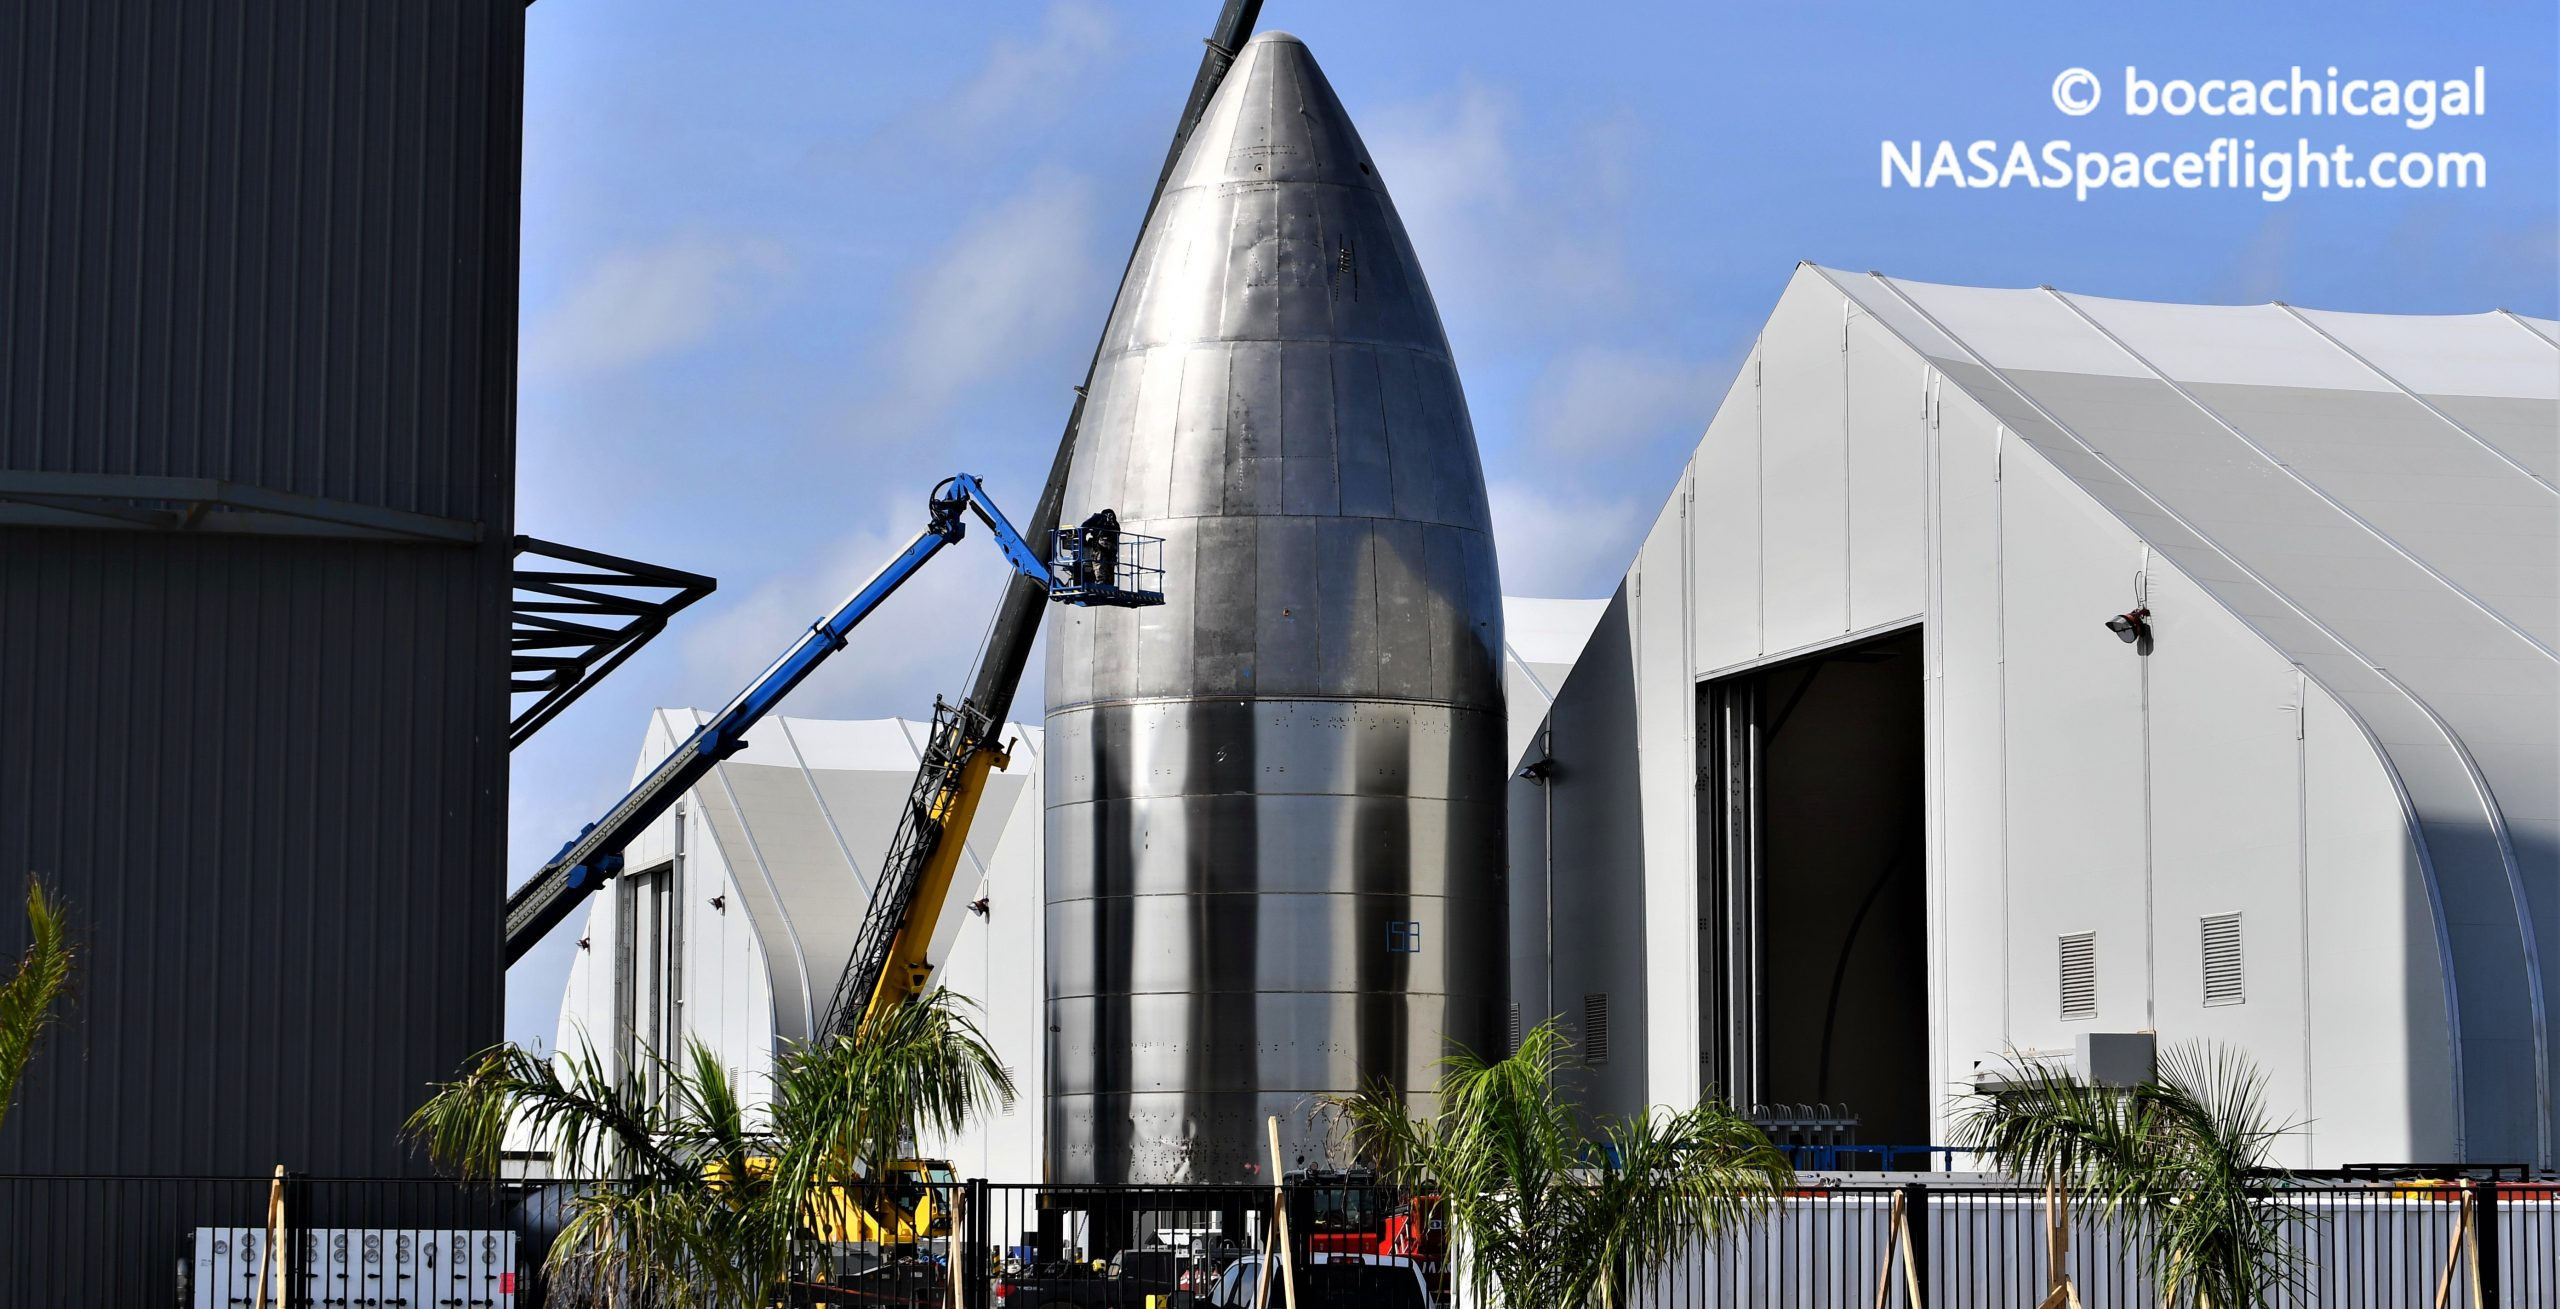 Starship Boca Chica 101420 (NASASpaceflight – bocachicagal) nose 4 crop